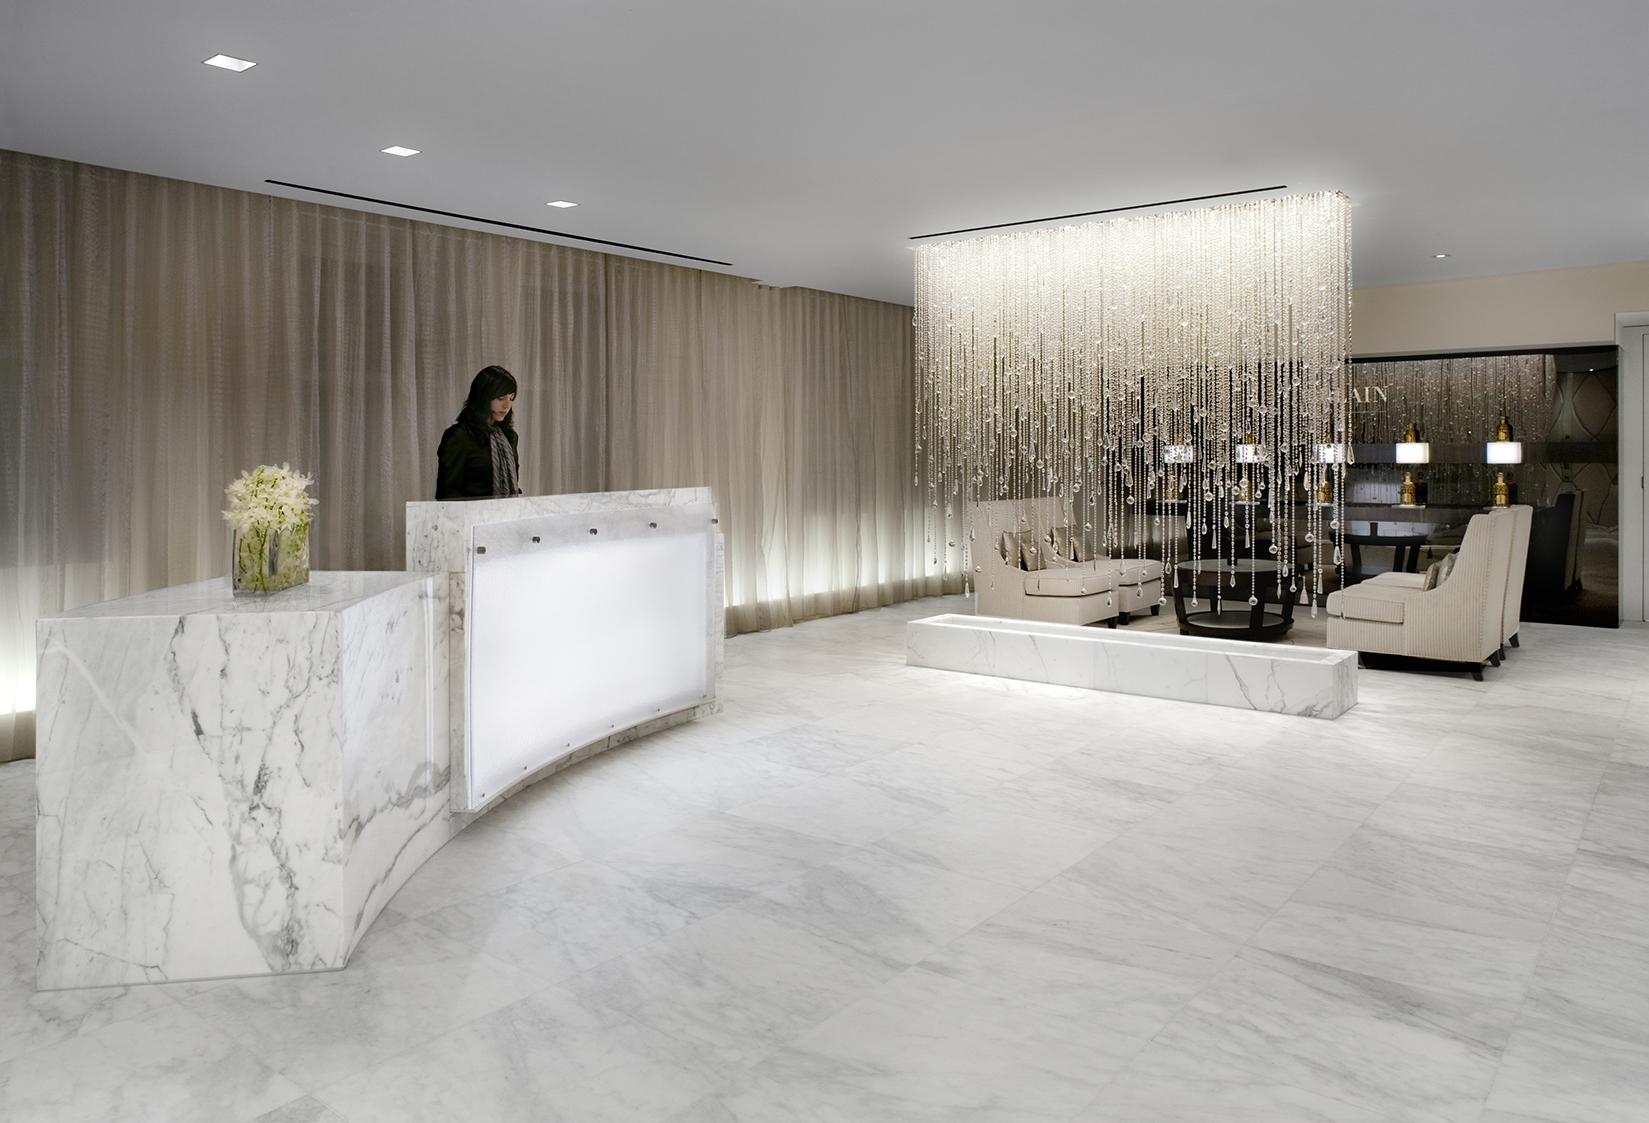 Guerlain NYC Spa Ceiling Fixture